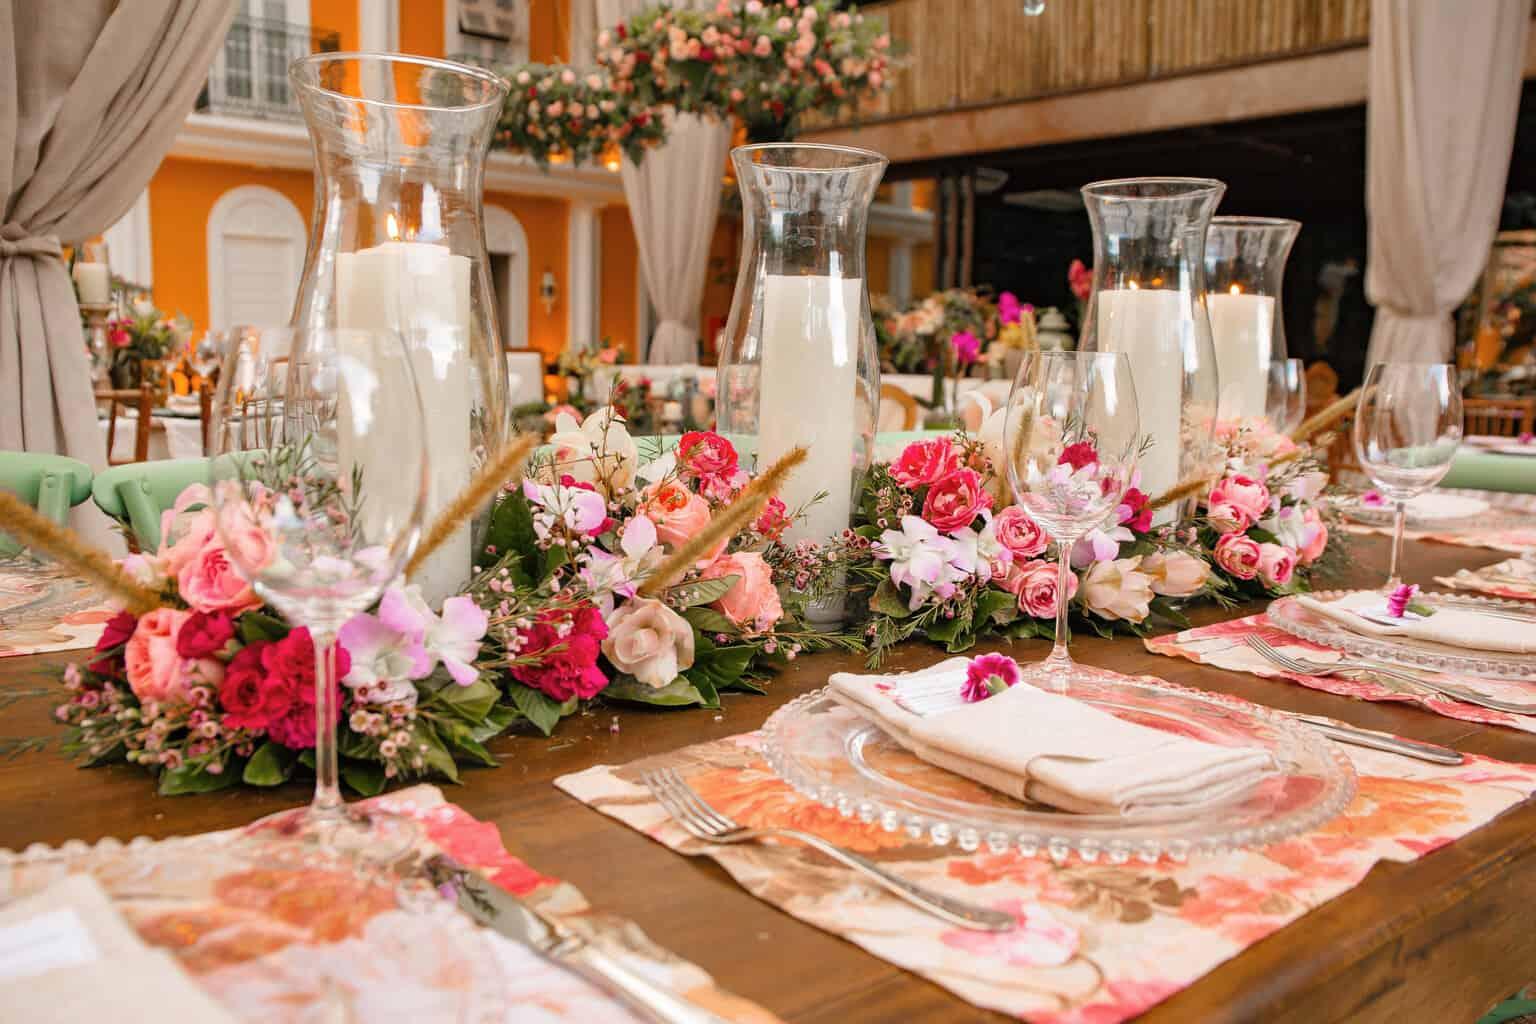 casamento-Beatriz-e-Joao-Fernando-decoracao-colorida-Itaipava-Locanda-Della-Mimosa-Thienny-Tammis84